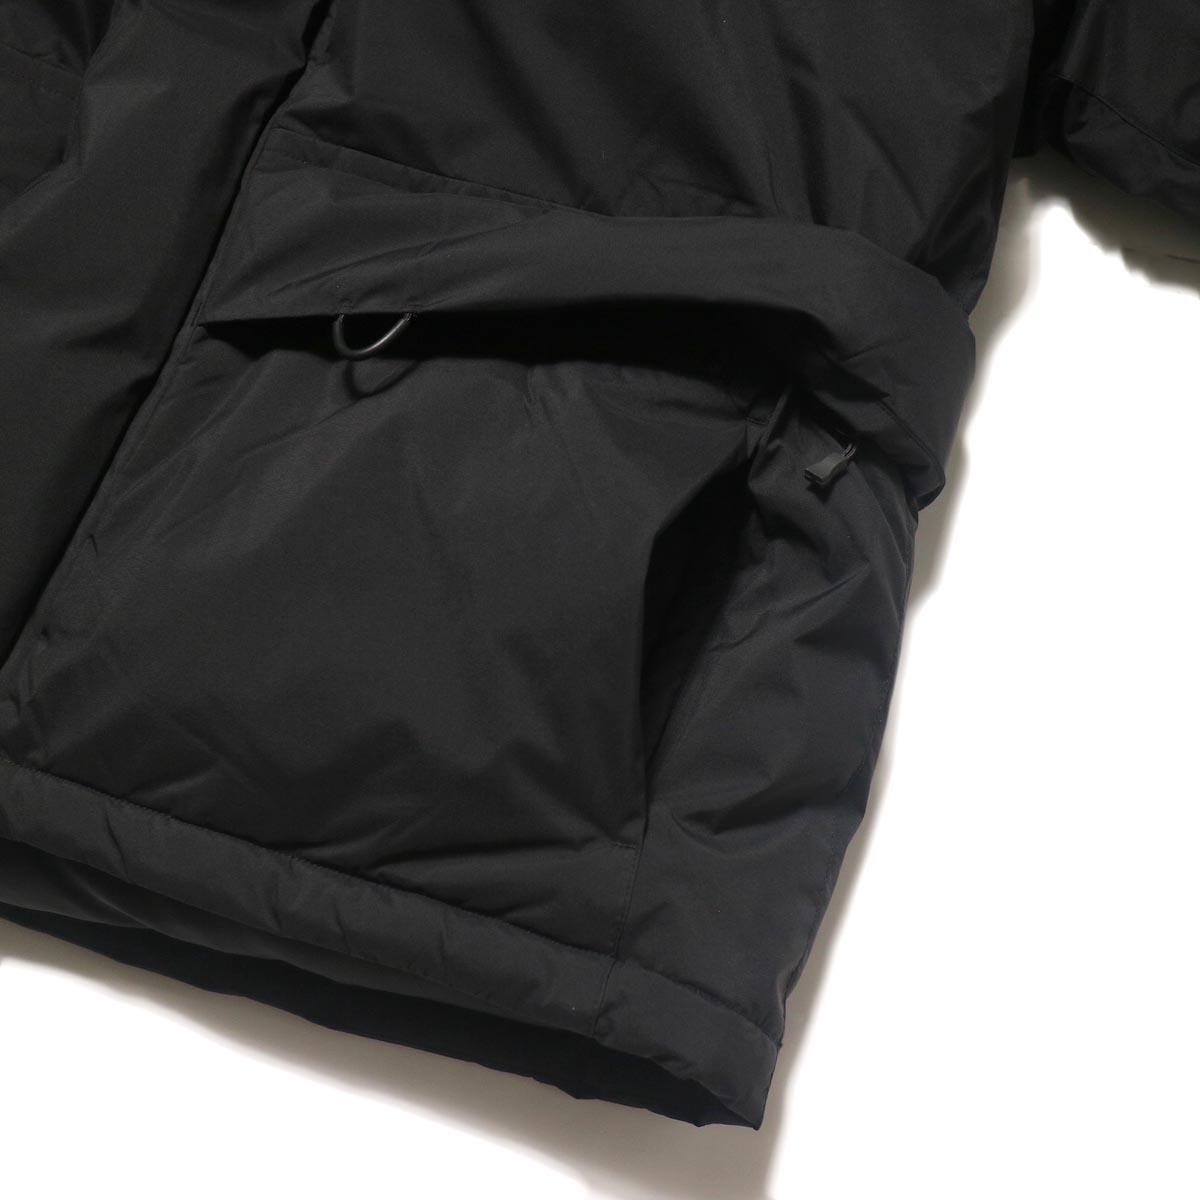 DAIWA PIER39 / GORE-TEX INFINIUM EXPEDITION DOWN JACKET (Black)フタ付きポケット、ハンドウォーマー